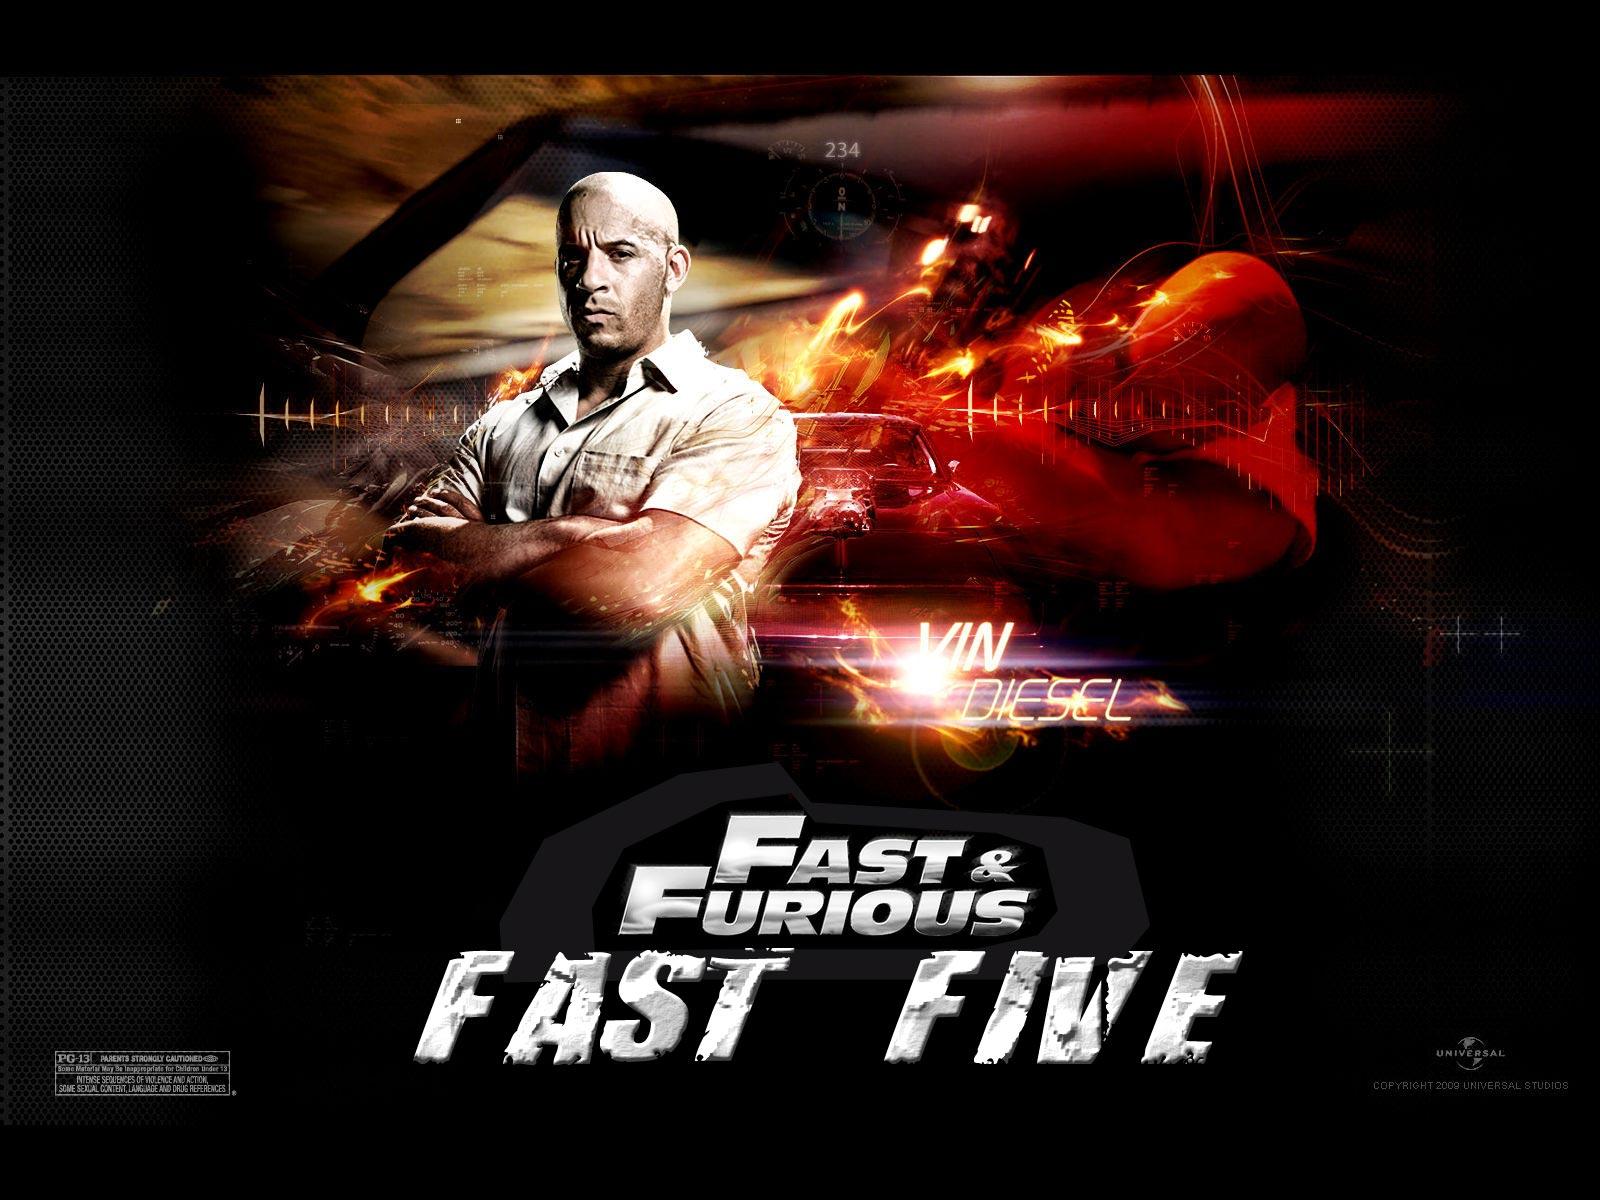 http://1.bp.blogspot.com/-EXNKxvXoW70/TcdaXhr1xYI/AAAAAAAAAKI/h2ik7AFz6Ac/s1600/Peru-fecha-de-estreno-rapidos-y-furiosos-5-fast-five-sin-control.jpg